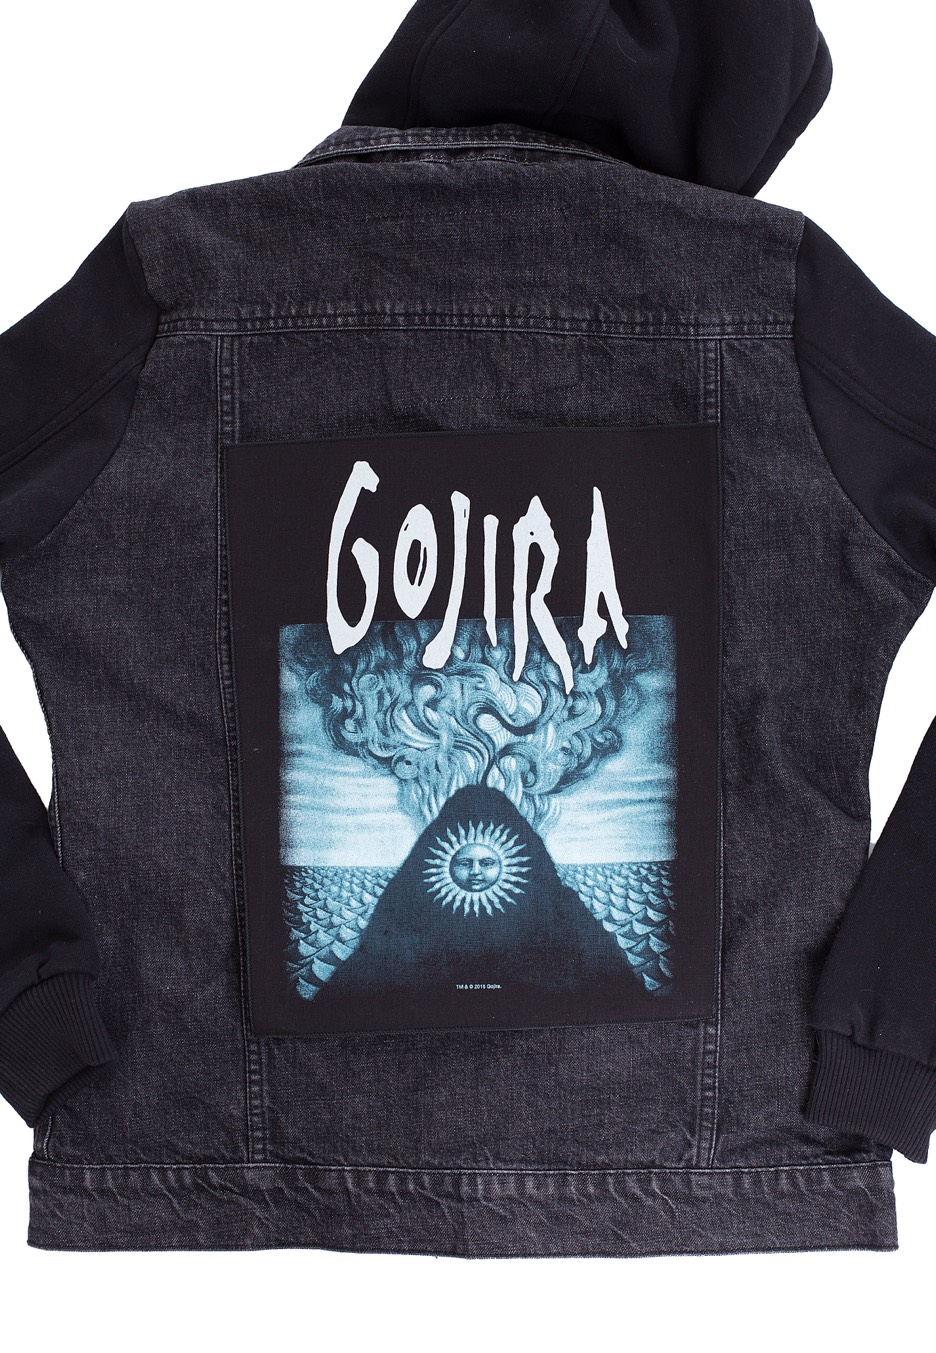 GOJIRA MAGMA Backpatch XLG Gojira Magma Back Patch